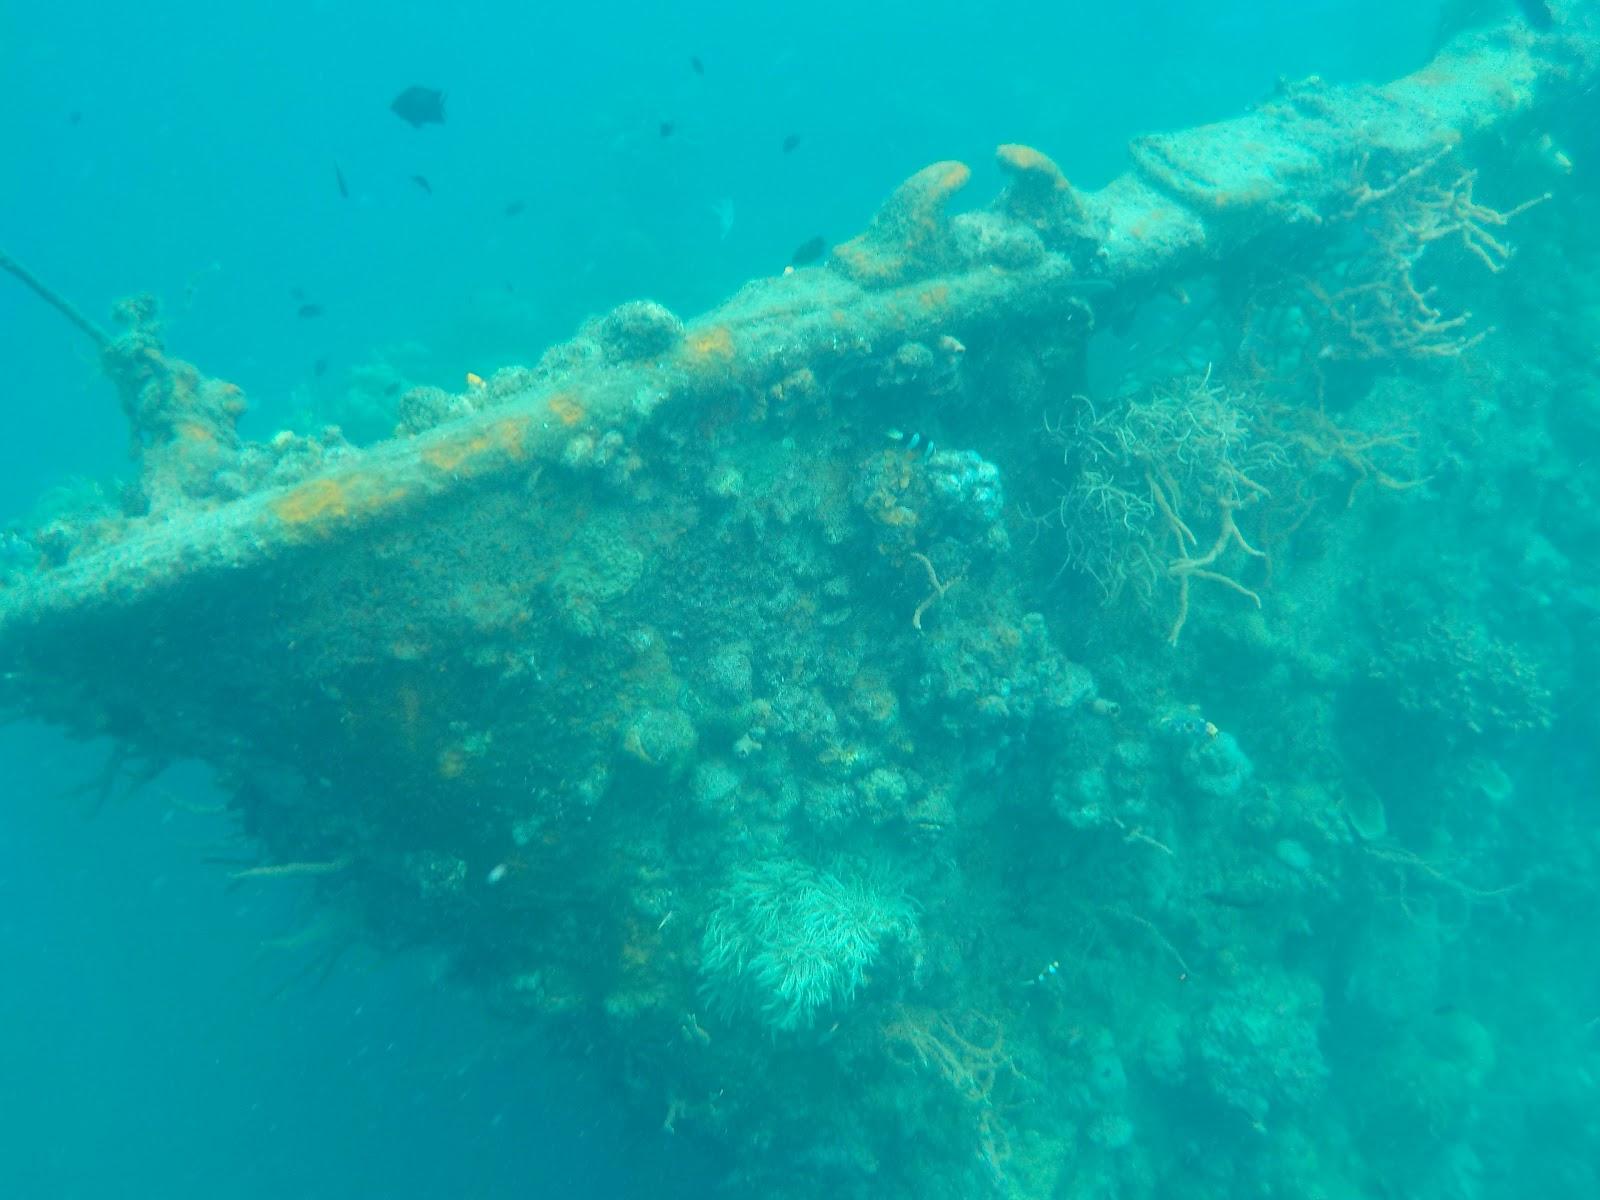 Lezbetravellers : Philippines day 24: Coron Reefs and Wrecks Tour